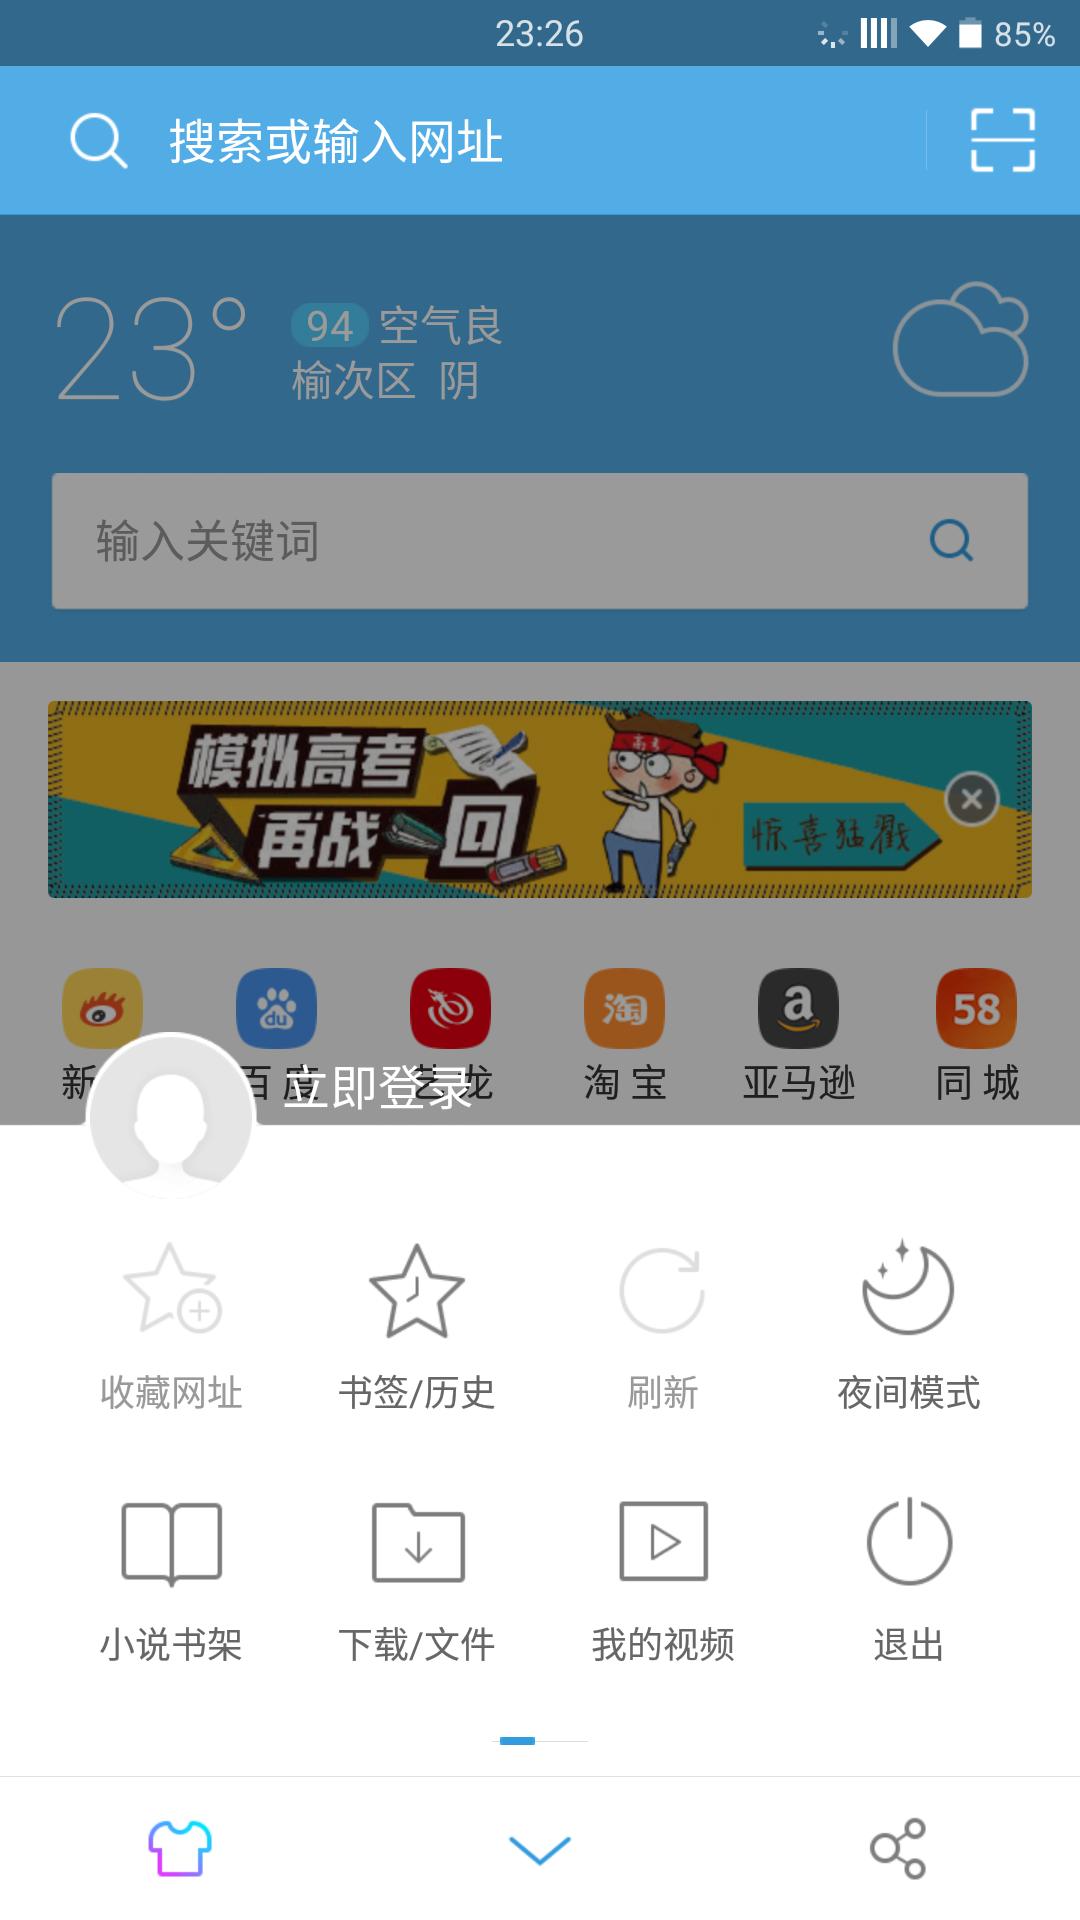 Screenshot_2015-06-06-23-26-21.png